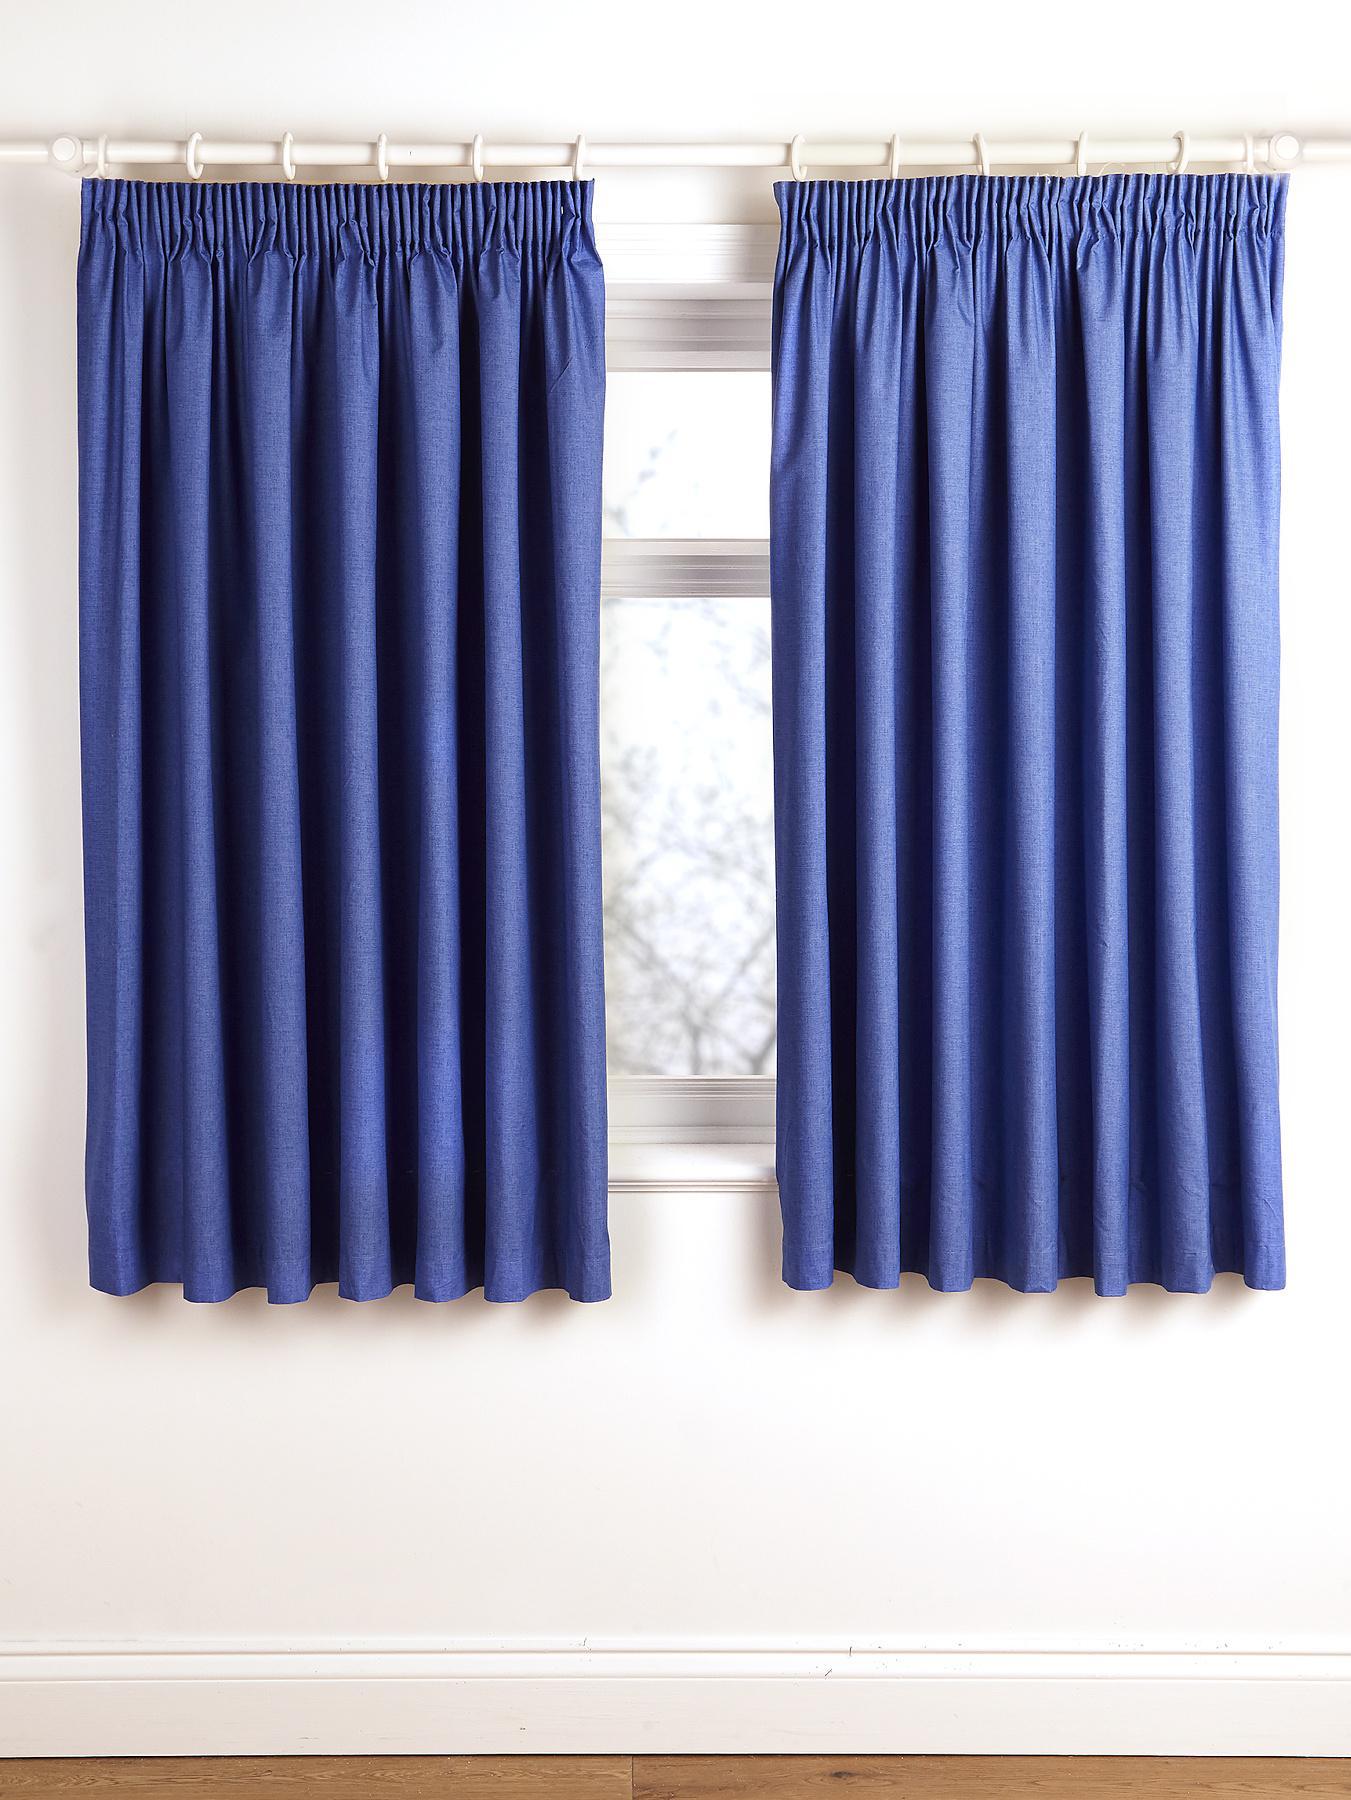 Kids Blackout Curtains, Beige,Pink,Blue.